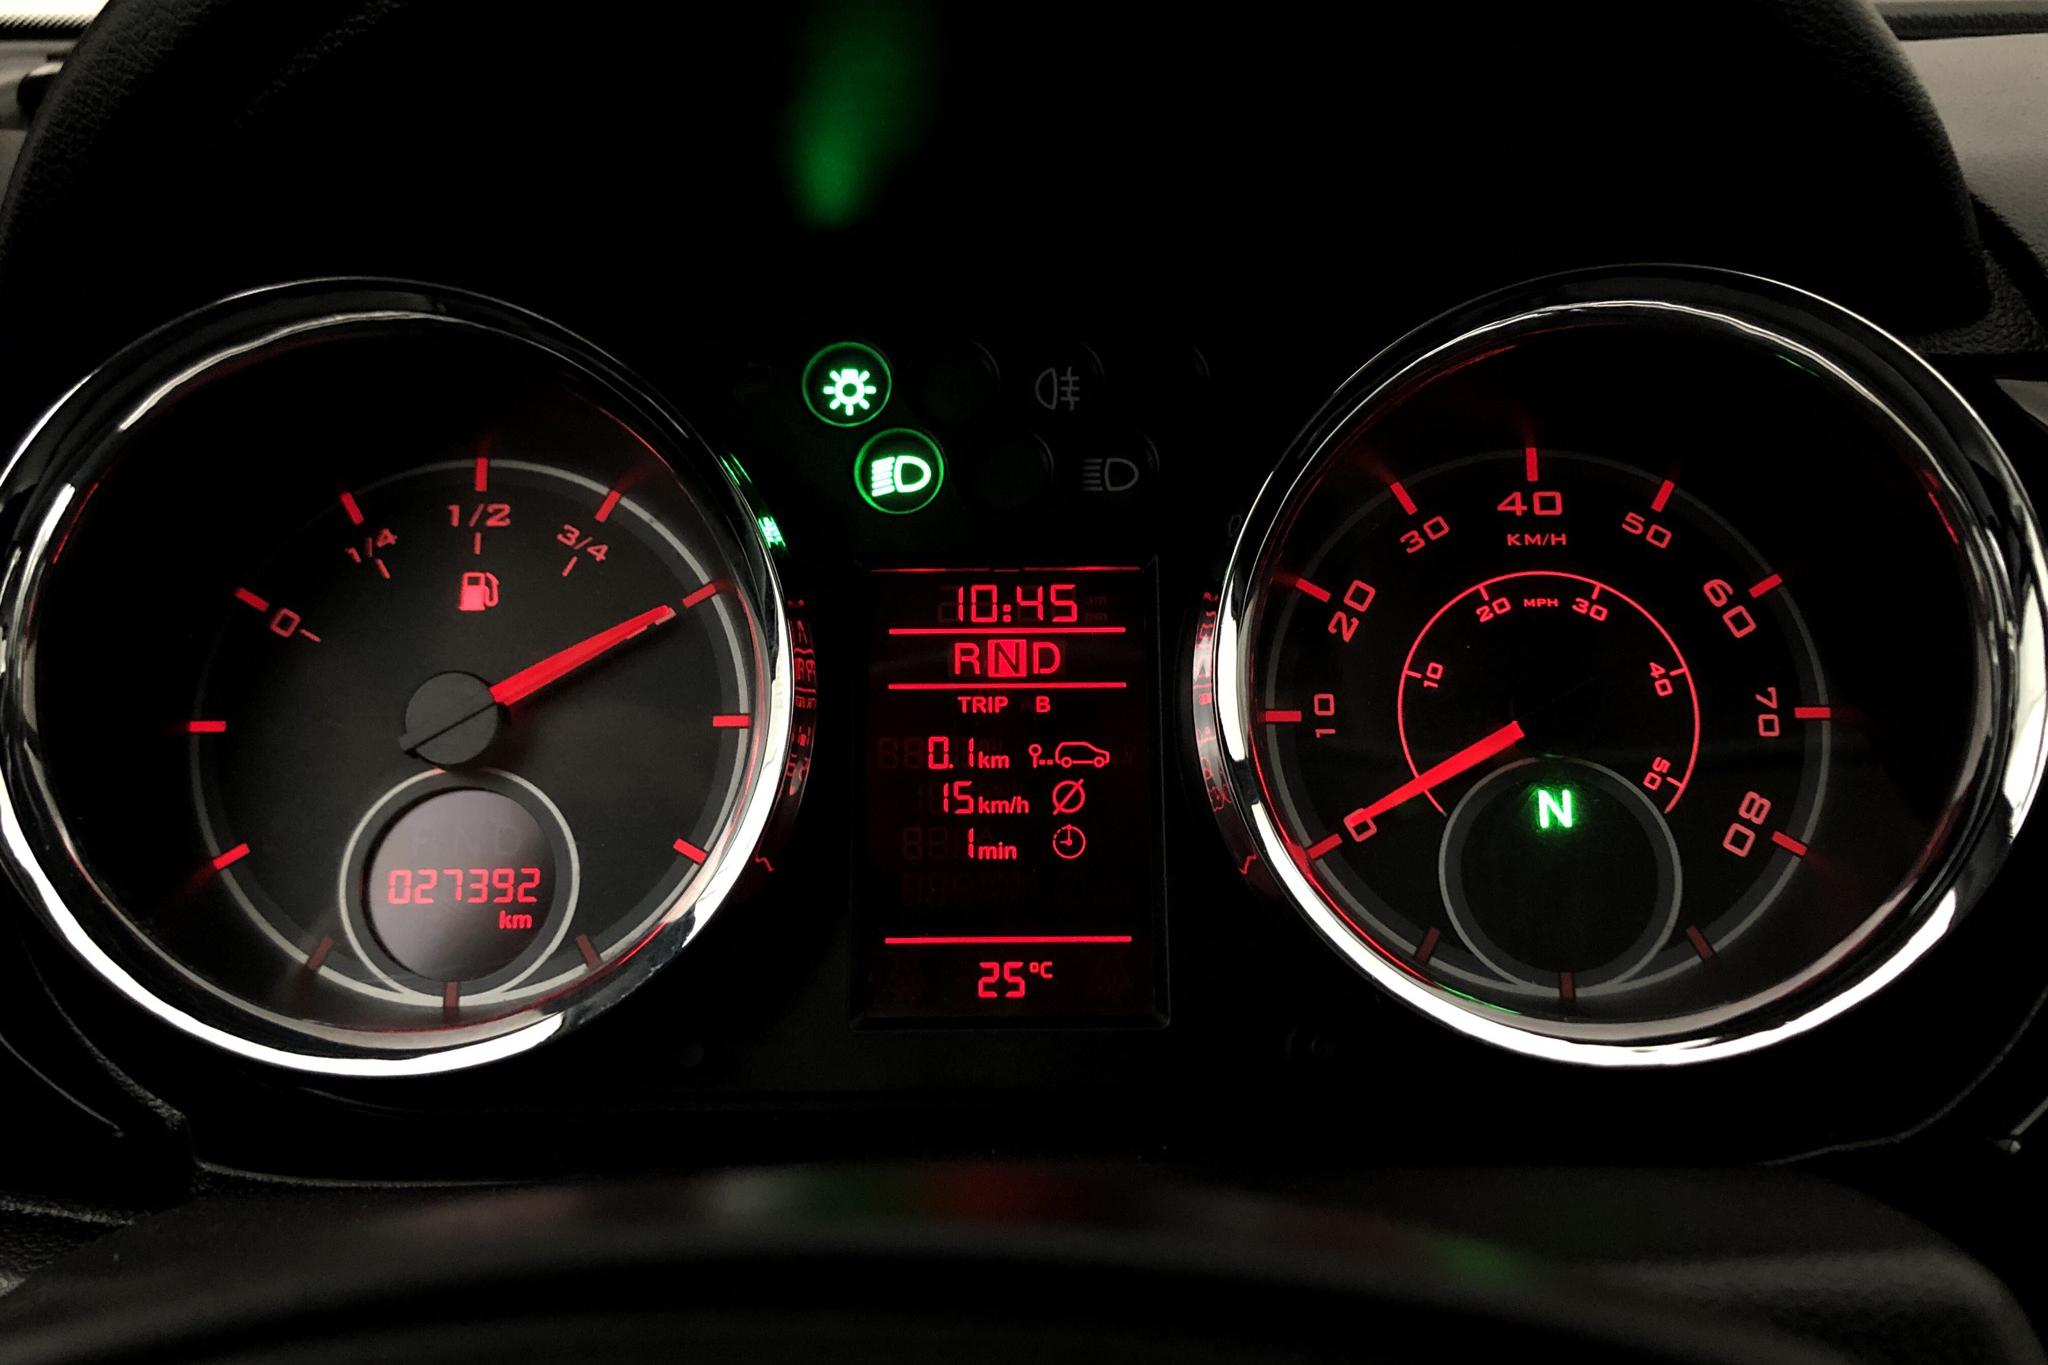 AIXAM S9 city Mopedbil - 27 390 km - Automatic - black - 2017